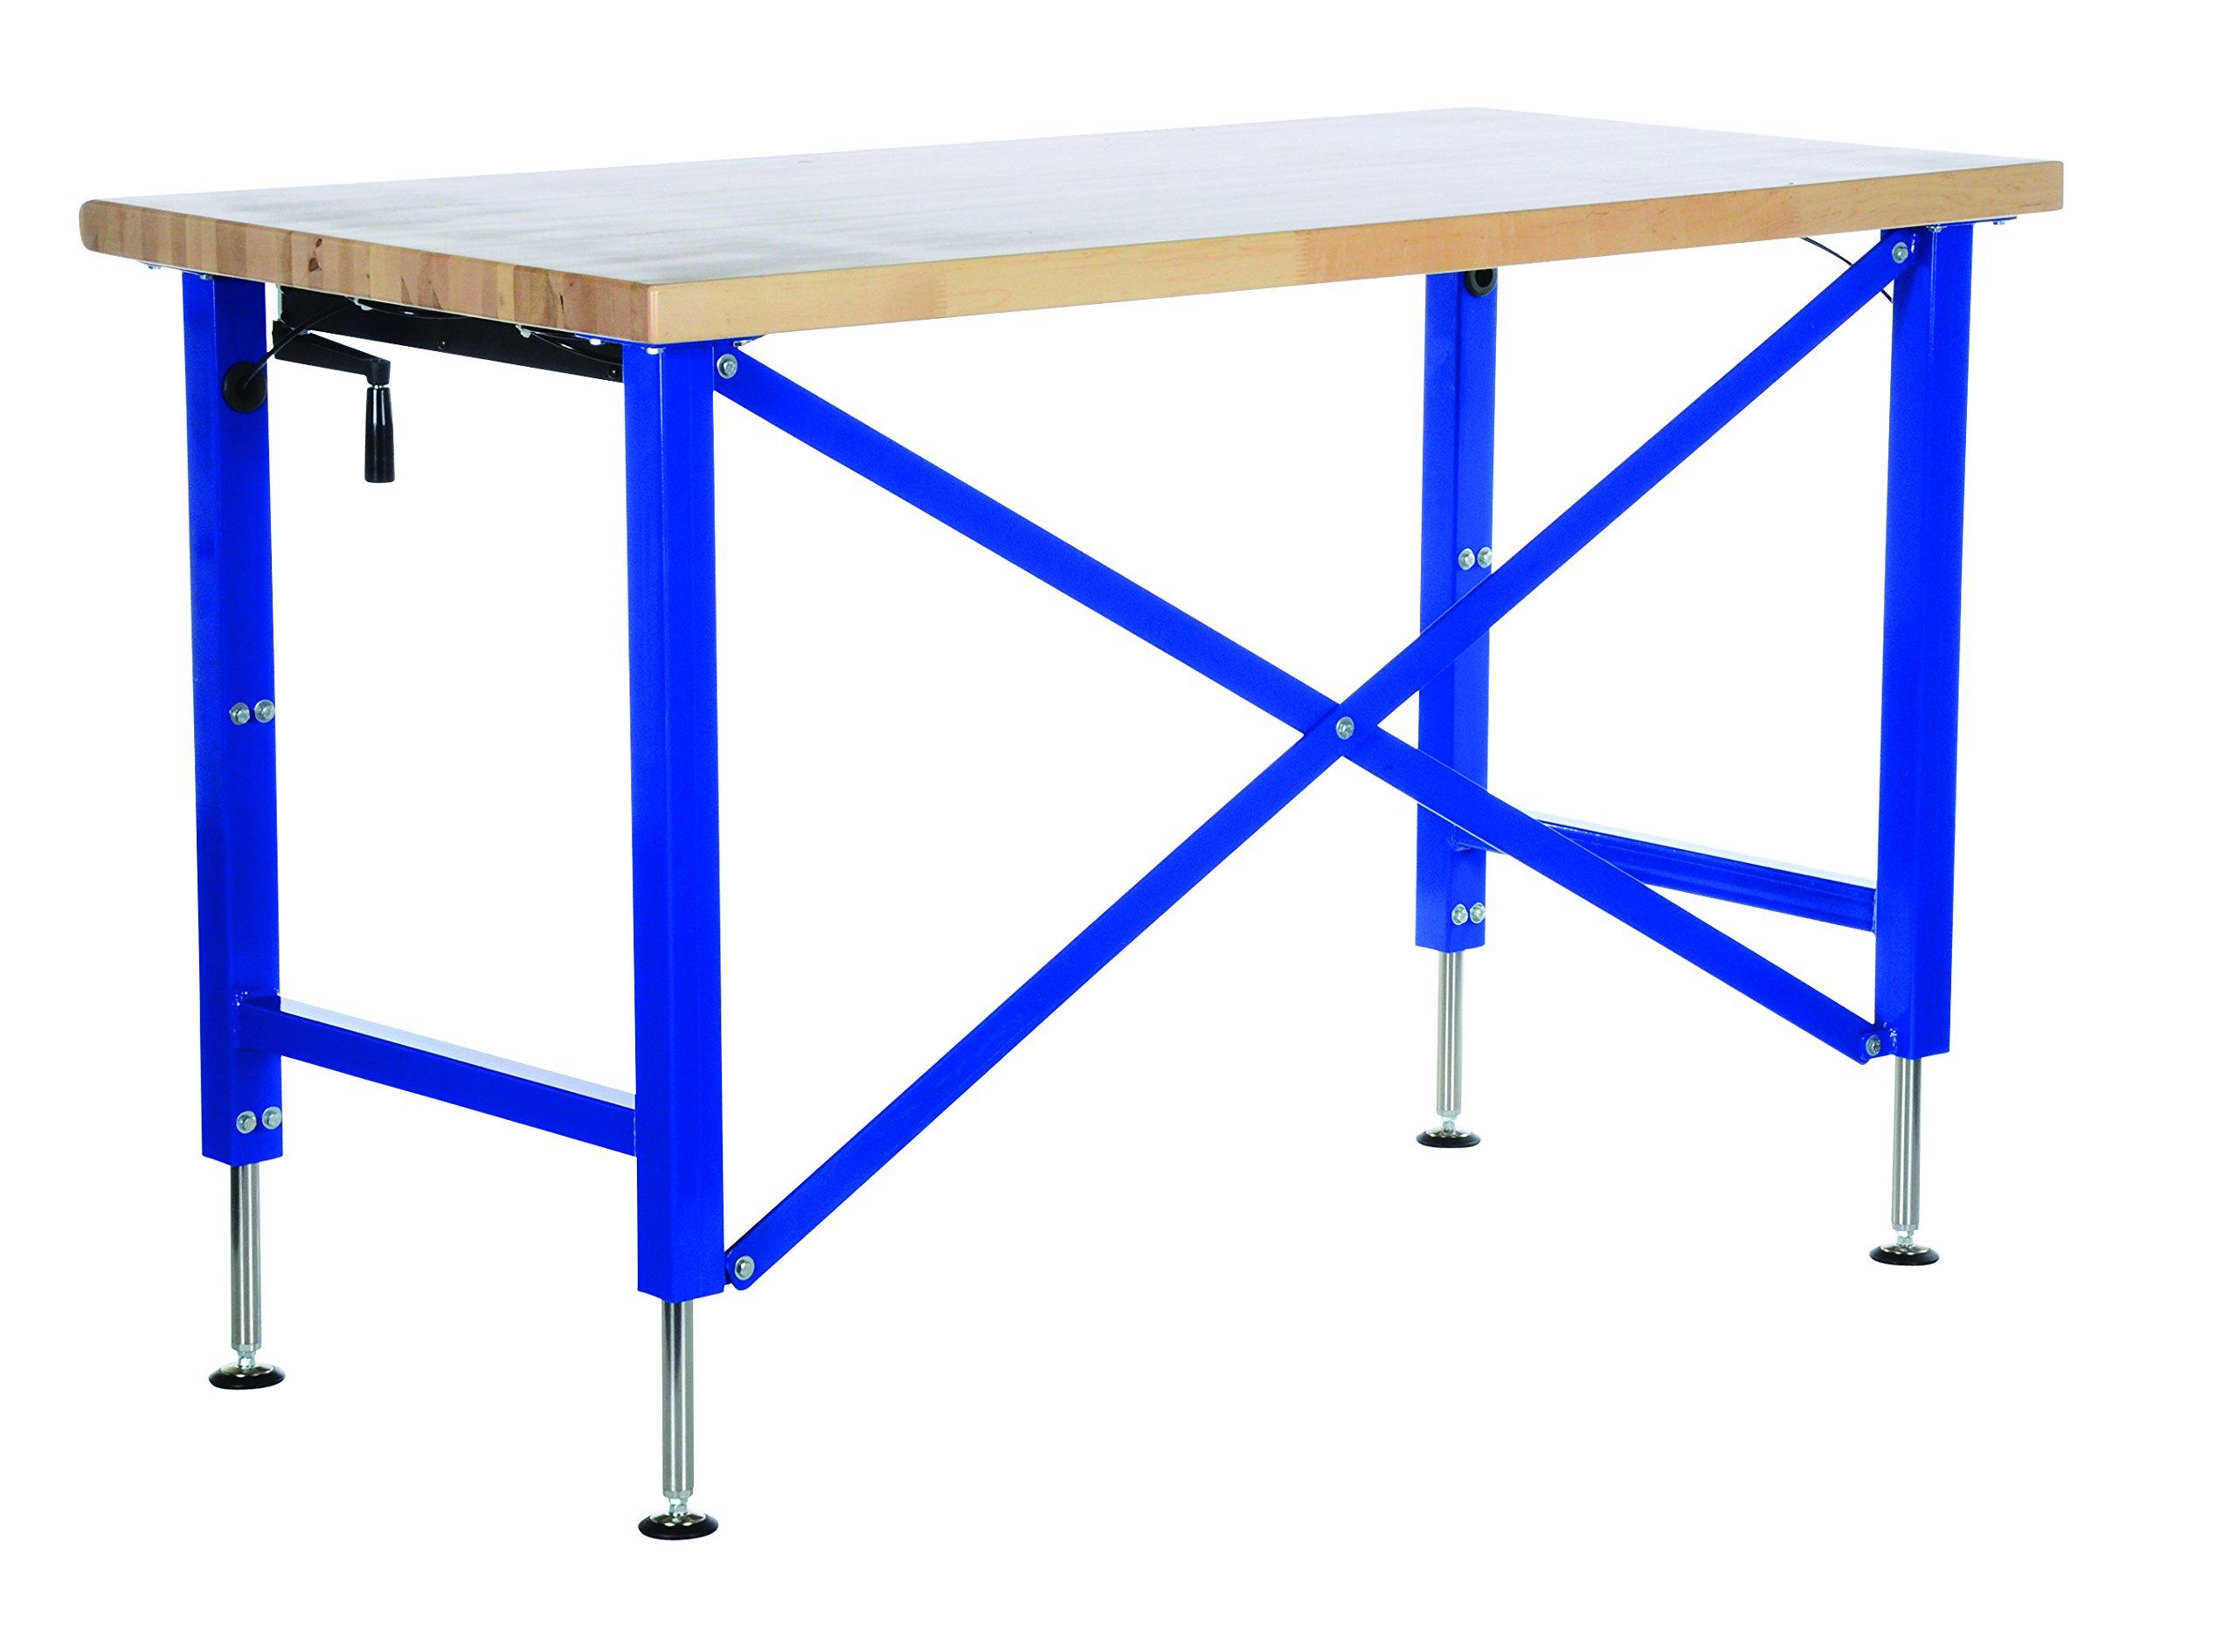 Vestil EWB-6030 Manually Adjustable Ergonomic Work Bench, 60'' x 30'', Blue/Tan by Vestil